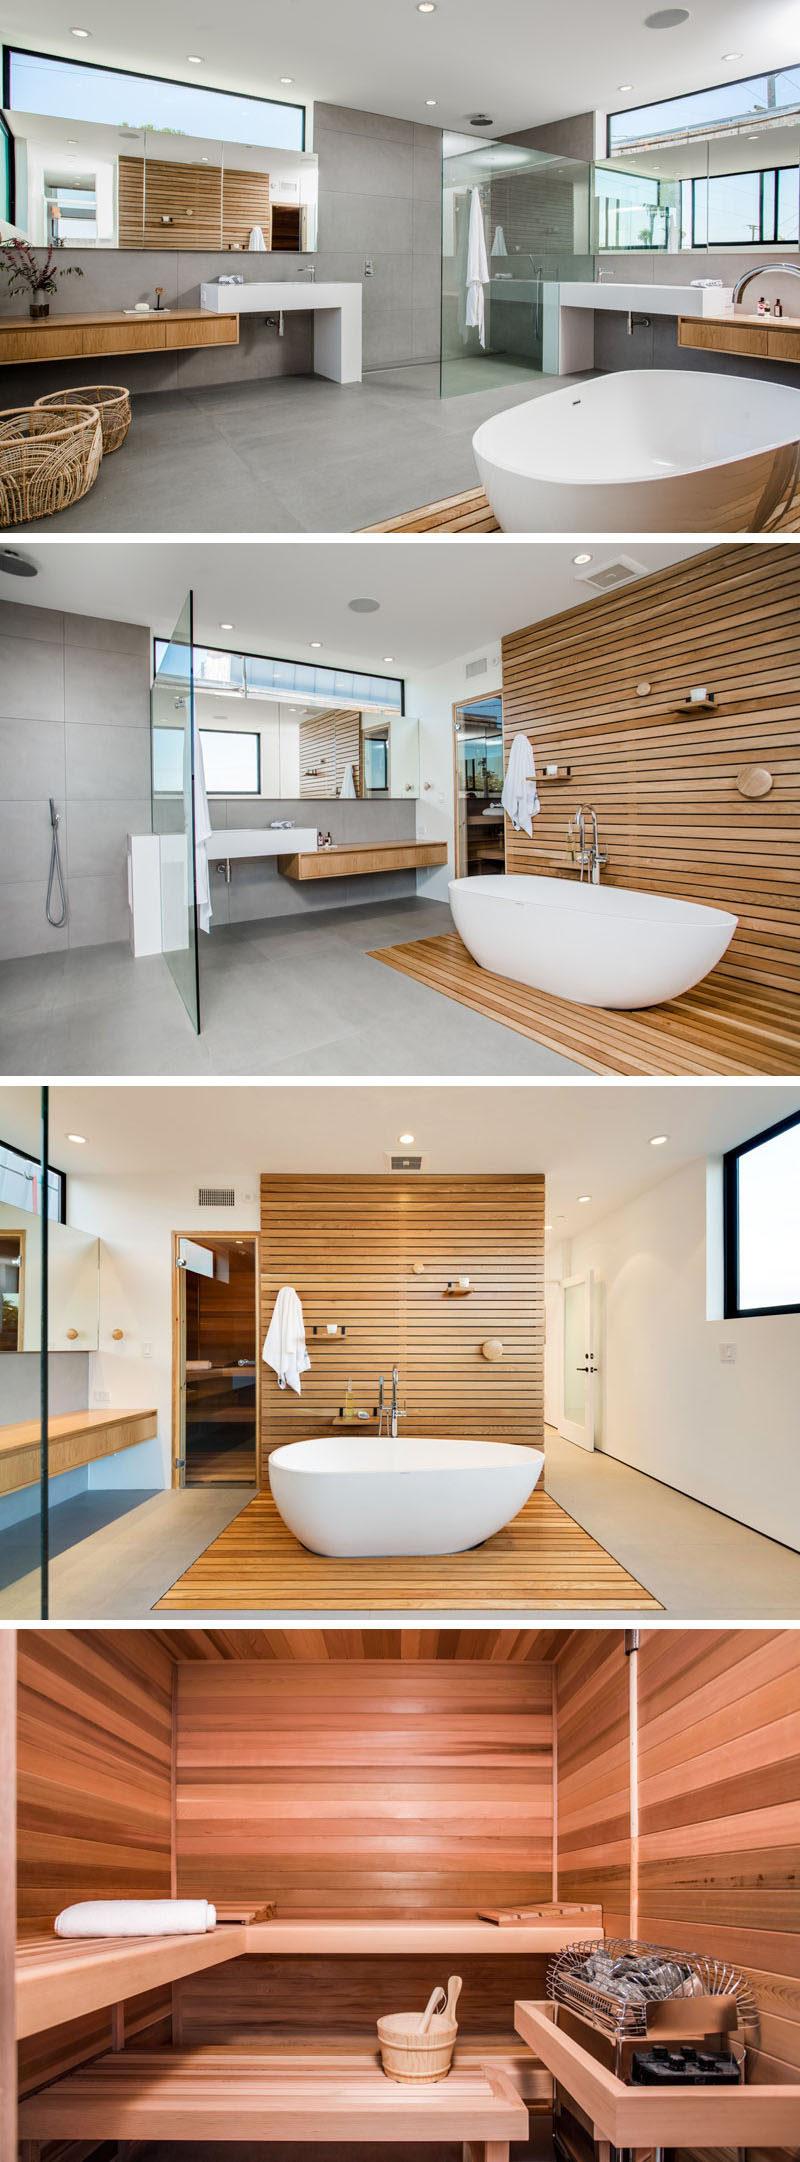 Bathroom Design Idea Create a Luxurious Spa Like Bathroom At Home